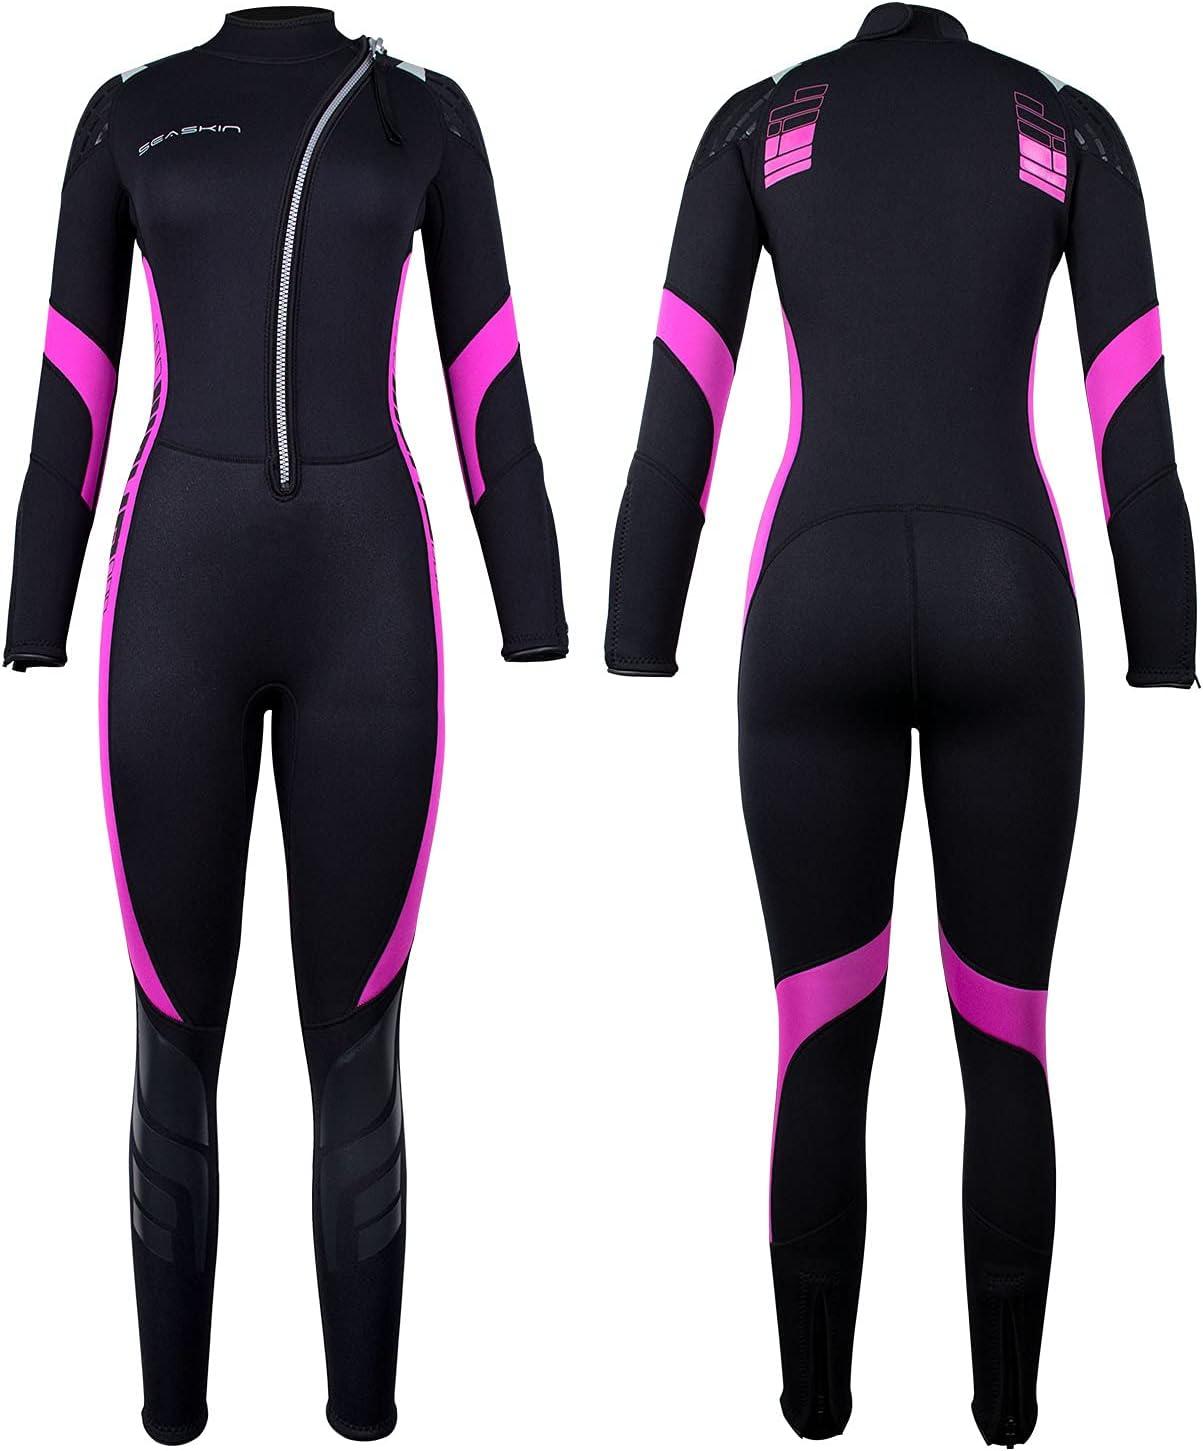 Seaskin Wetsuit Men Women 3mm Neoprene Fr Special Campaign Body Oakland Mall Full Diving Suits